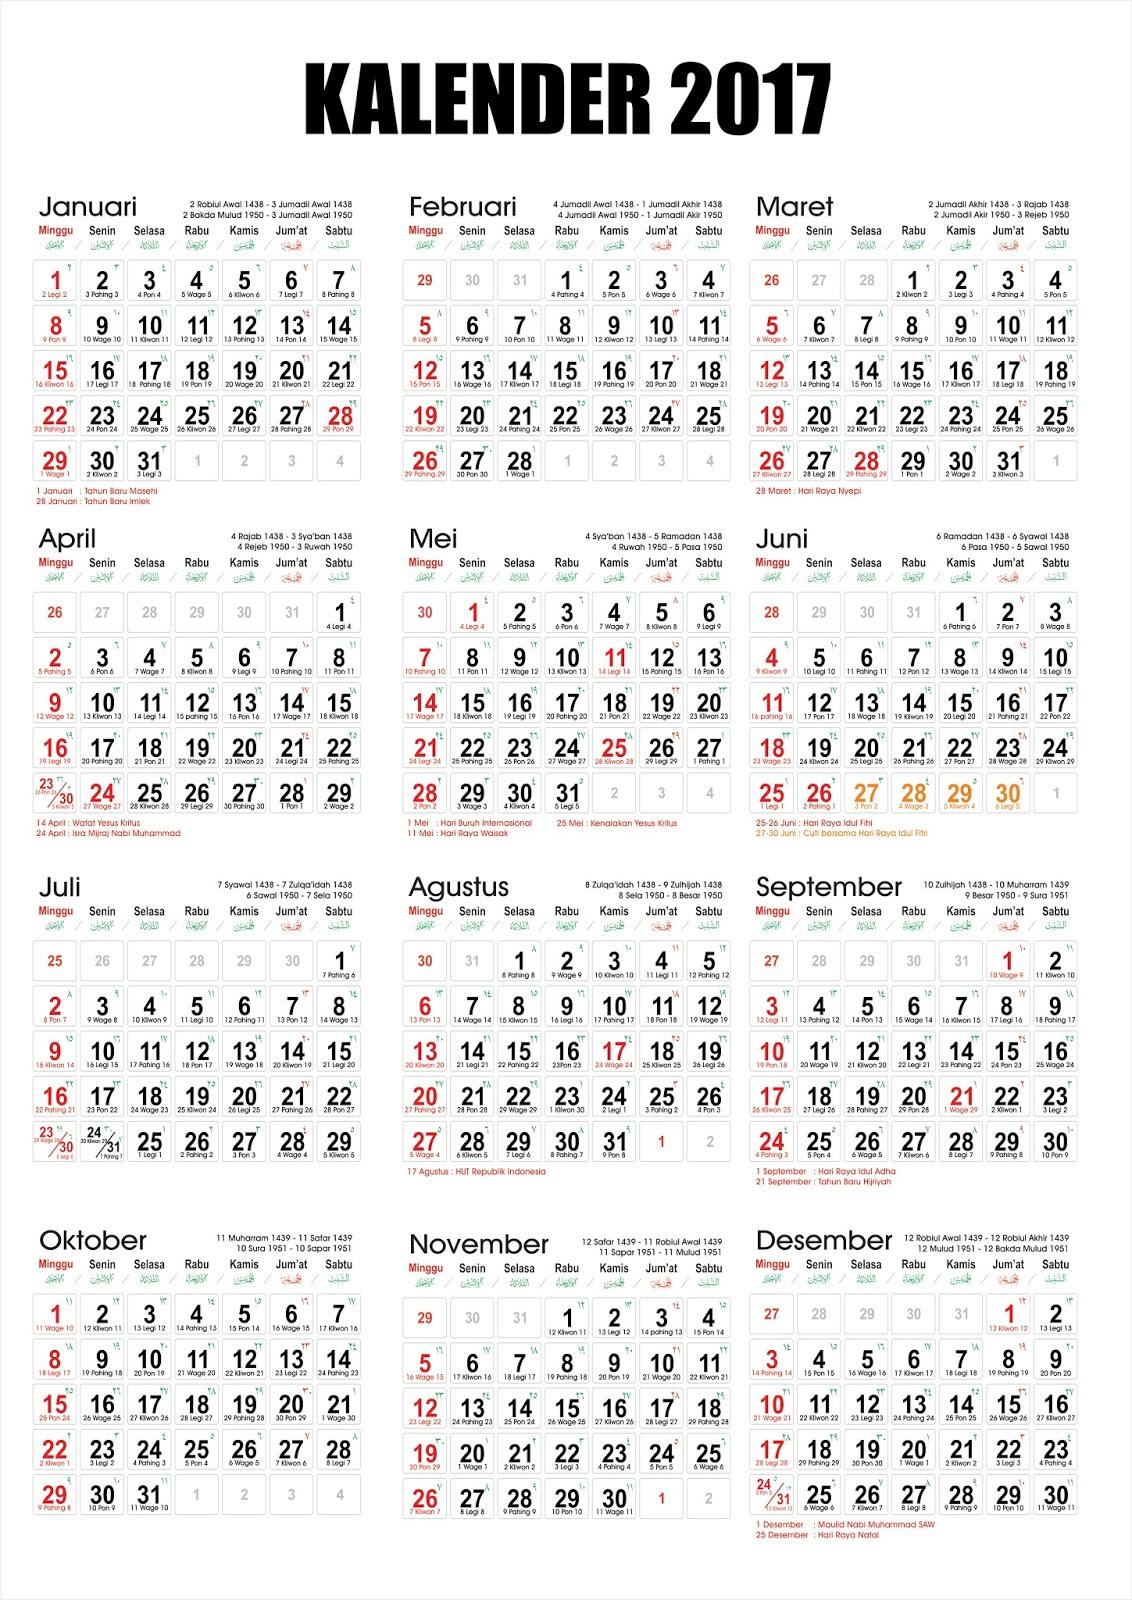 Kalender 2017 Belgie Related Keywords - Kalender 2017 Belgie Long Tail ...